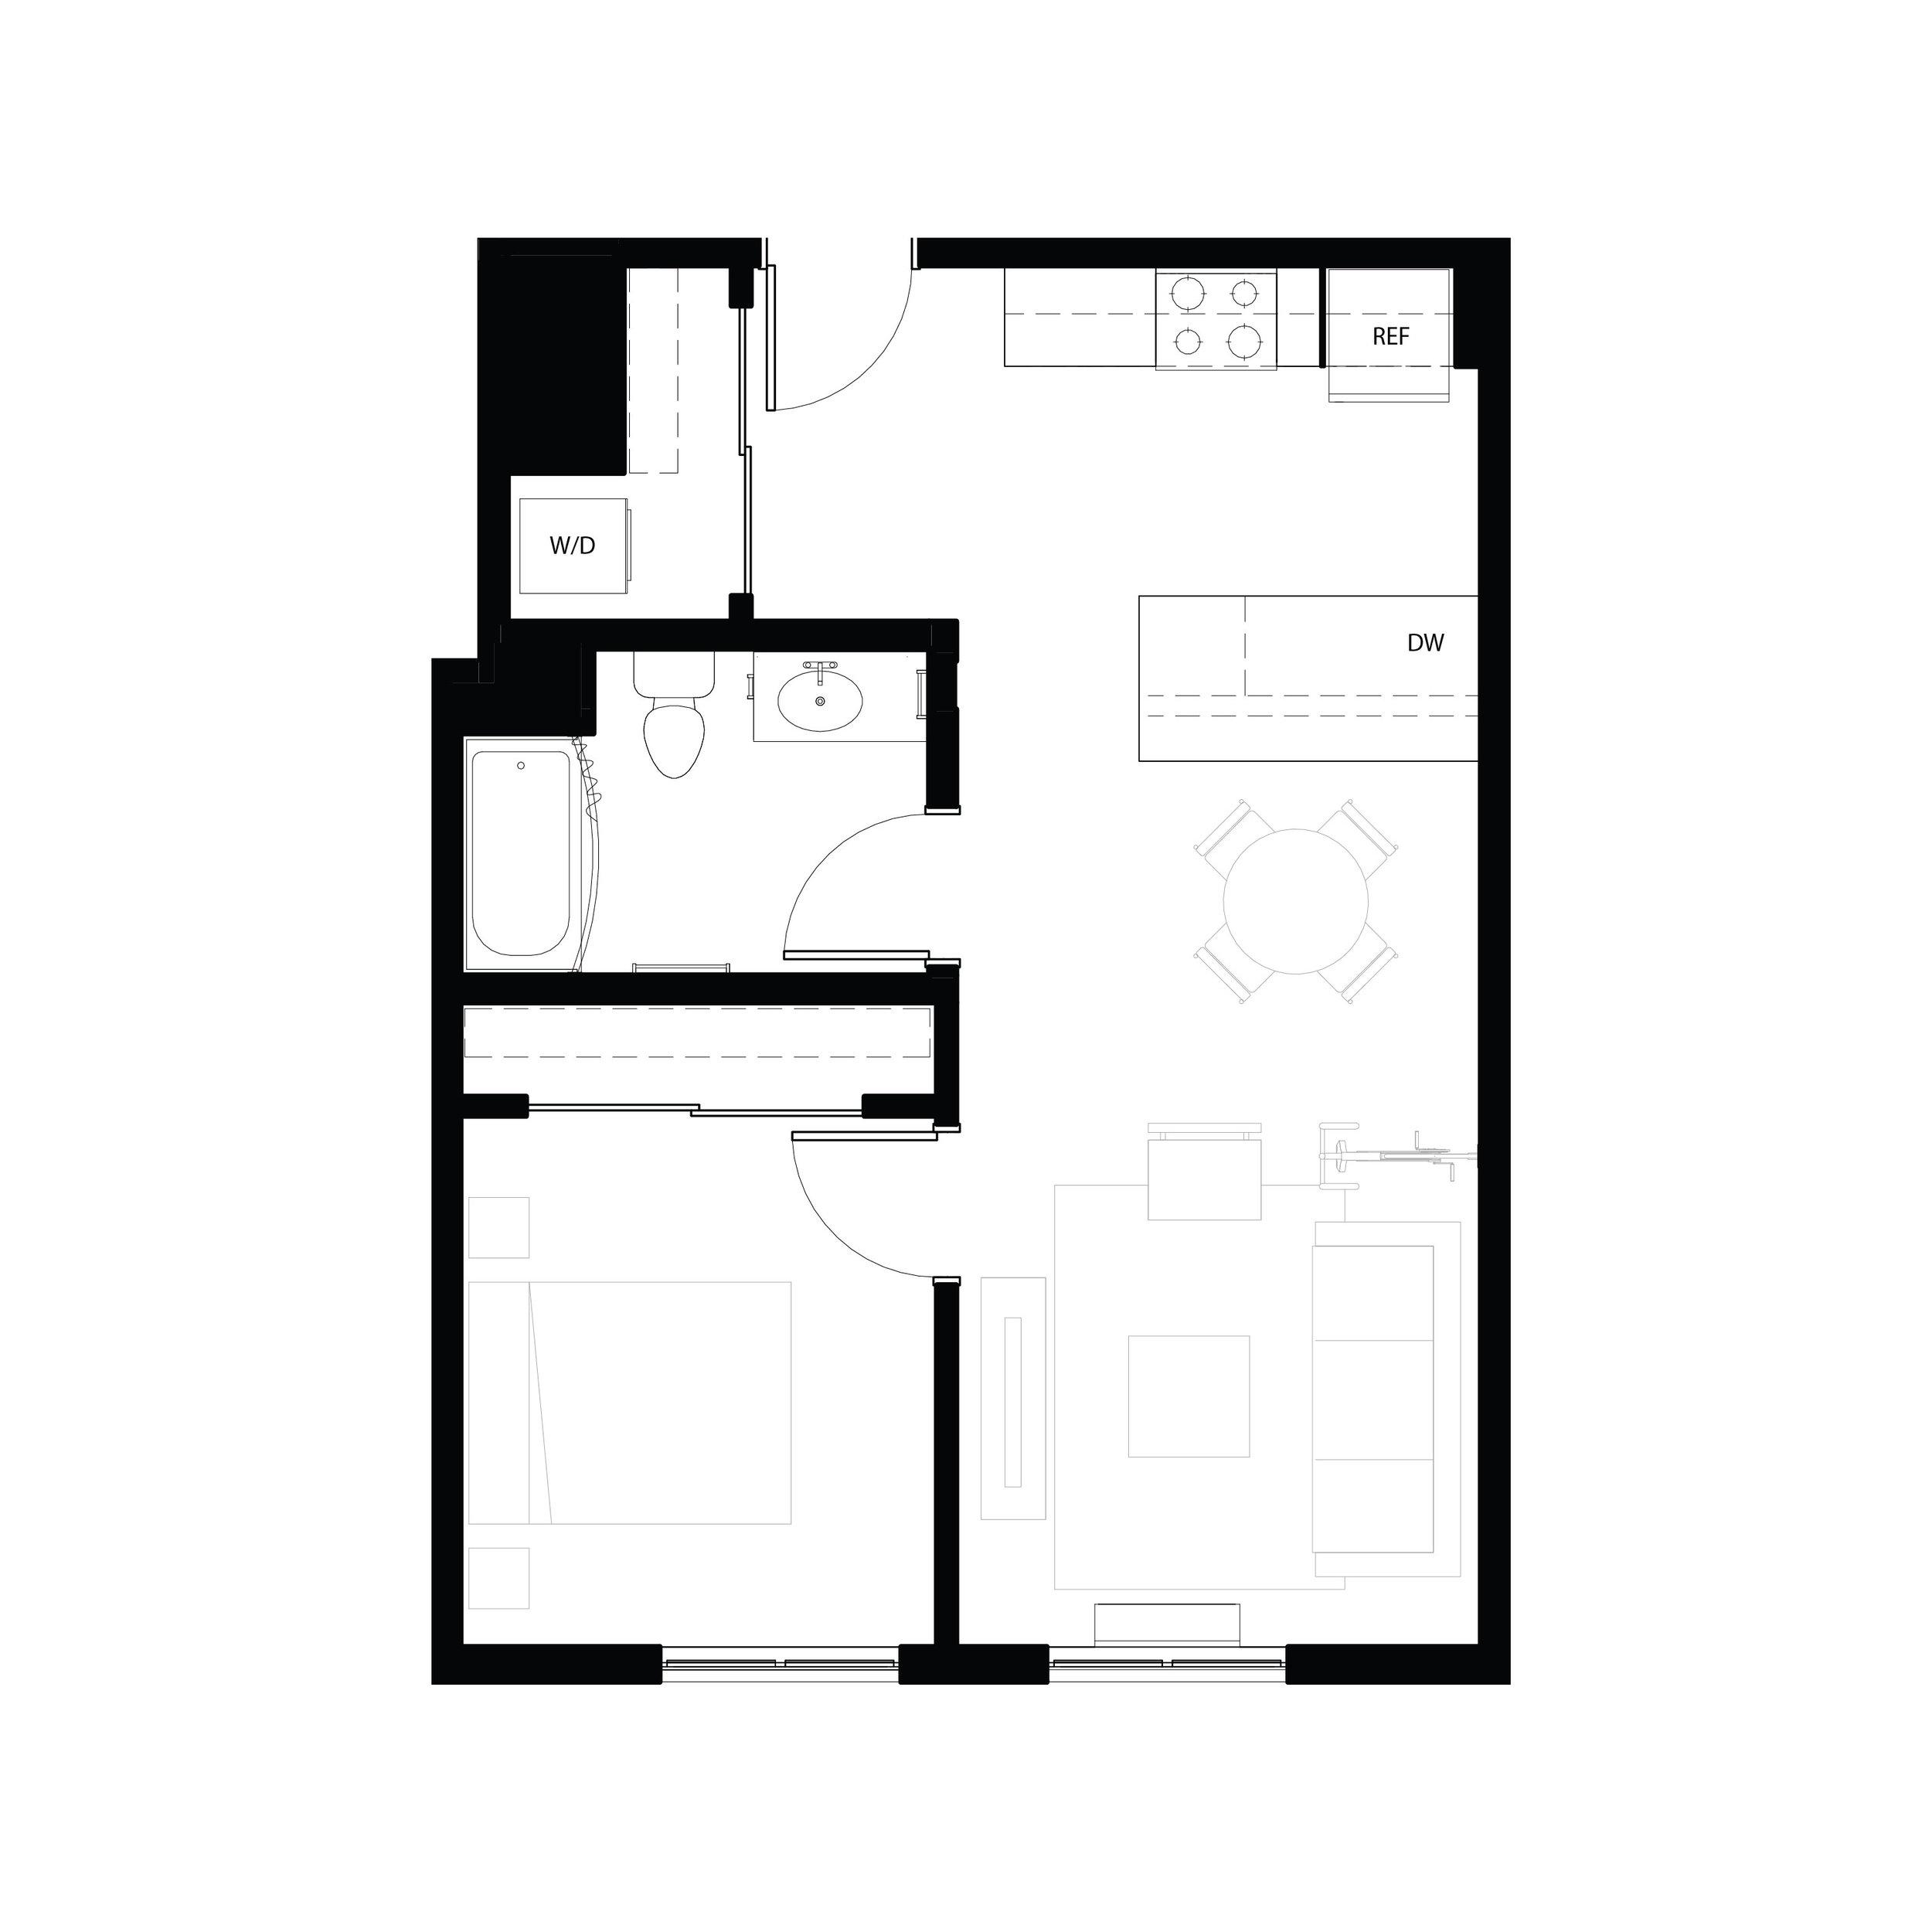 One bedroom 631 sq ft